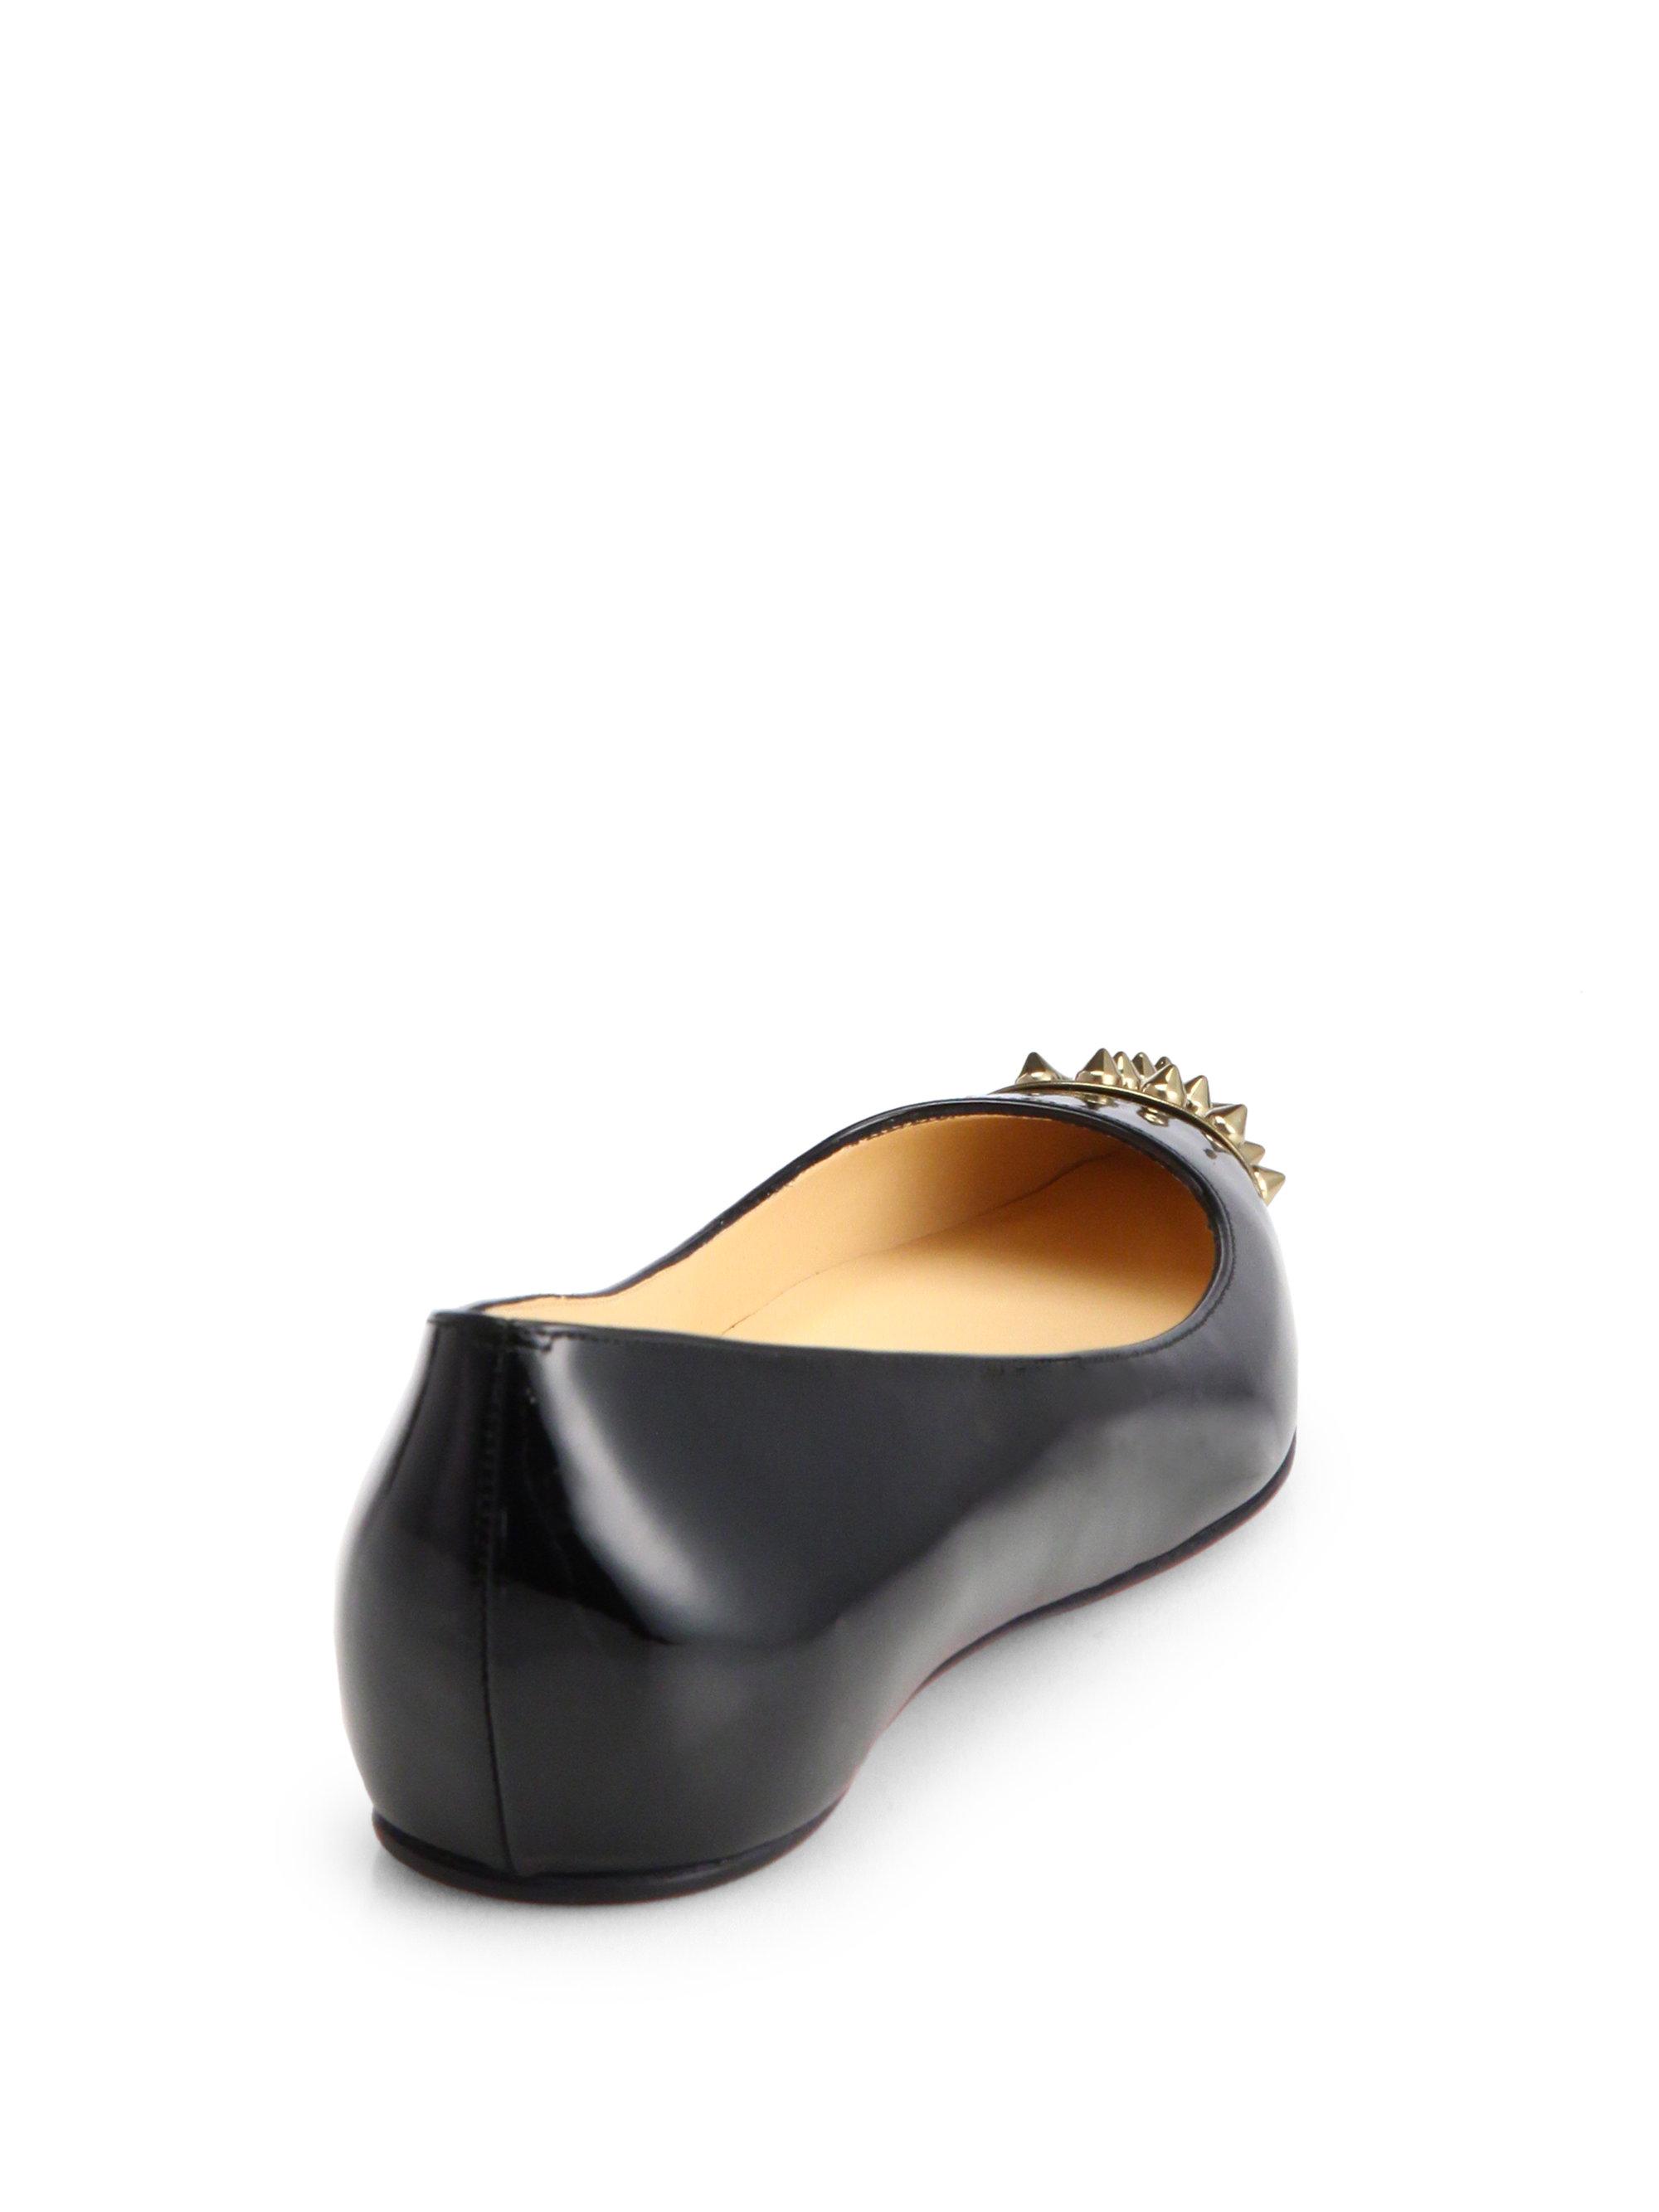 christian louboutin flats Metallic gold patent leather black cap ...